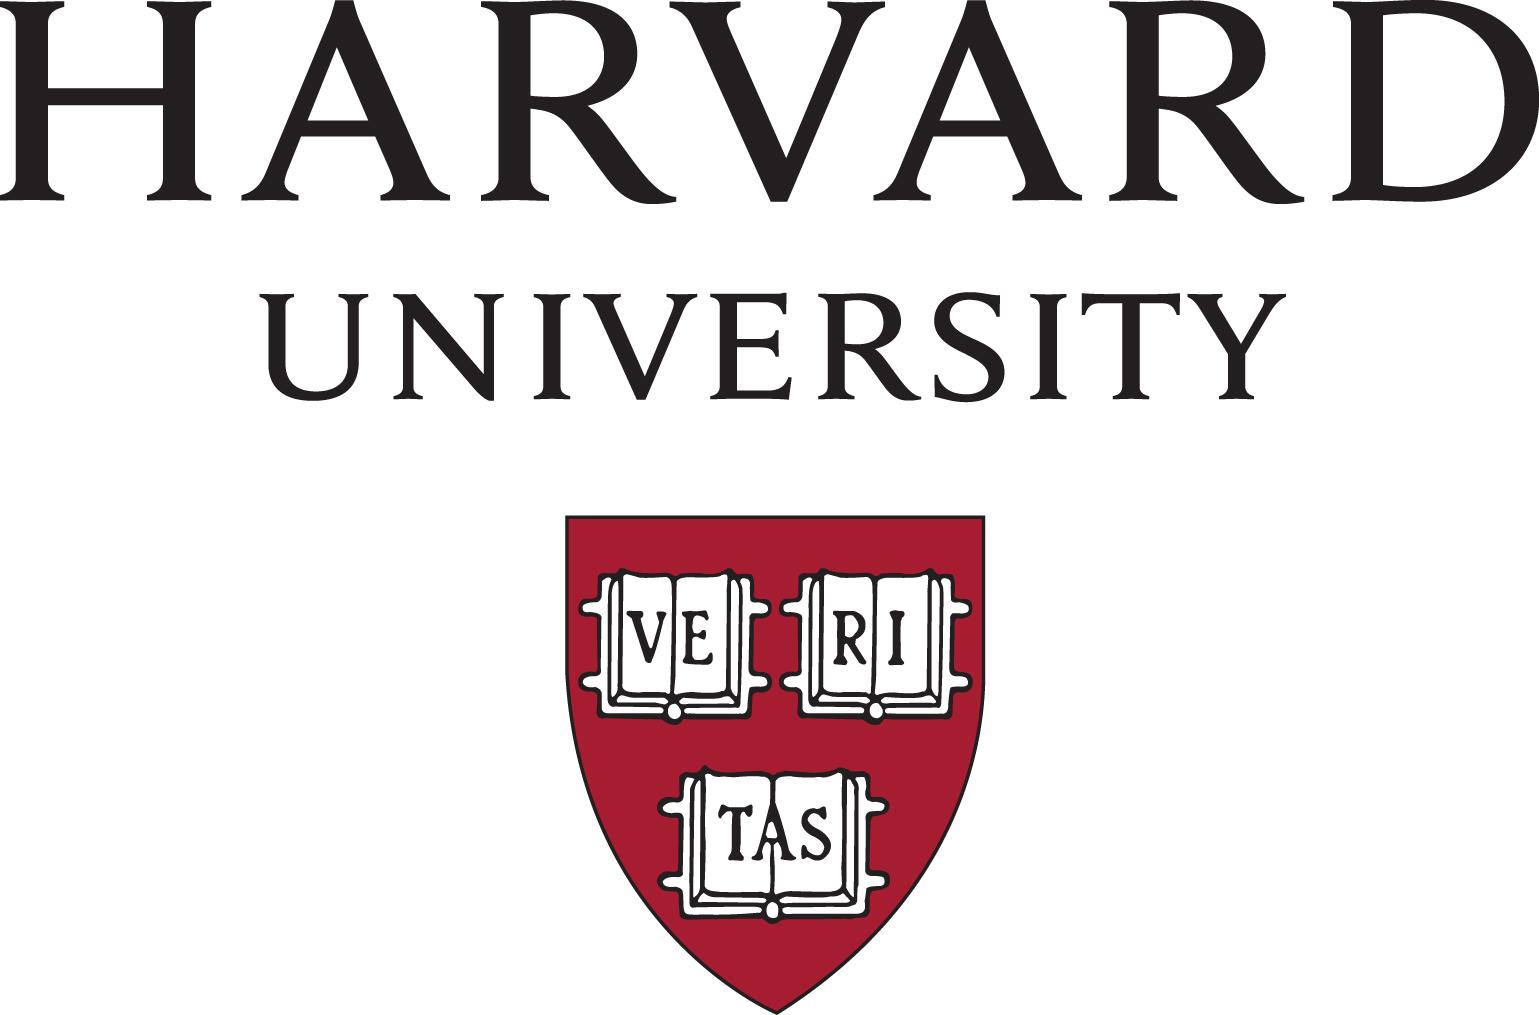 Becas para periodistas Harvard